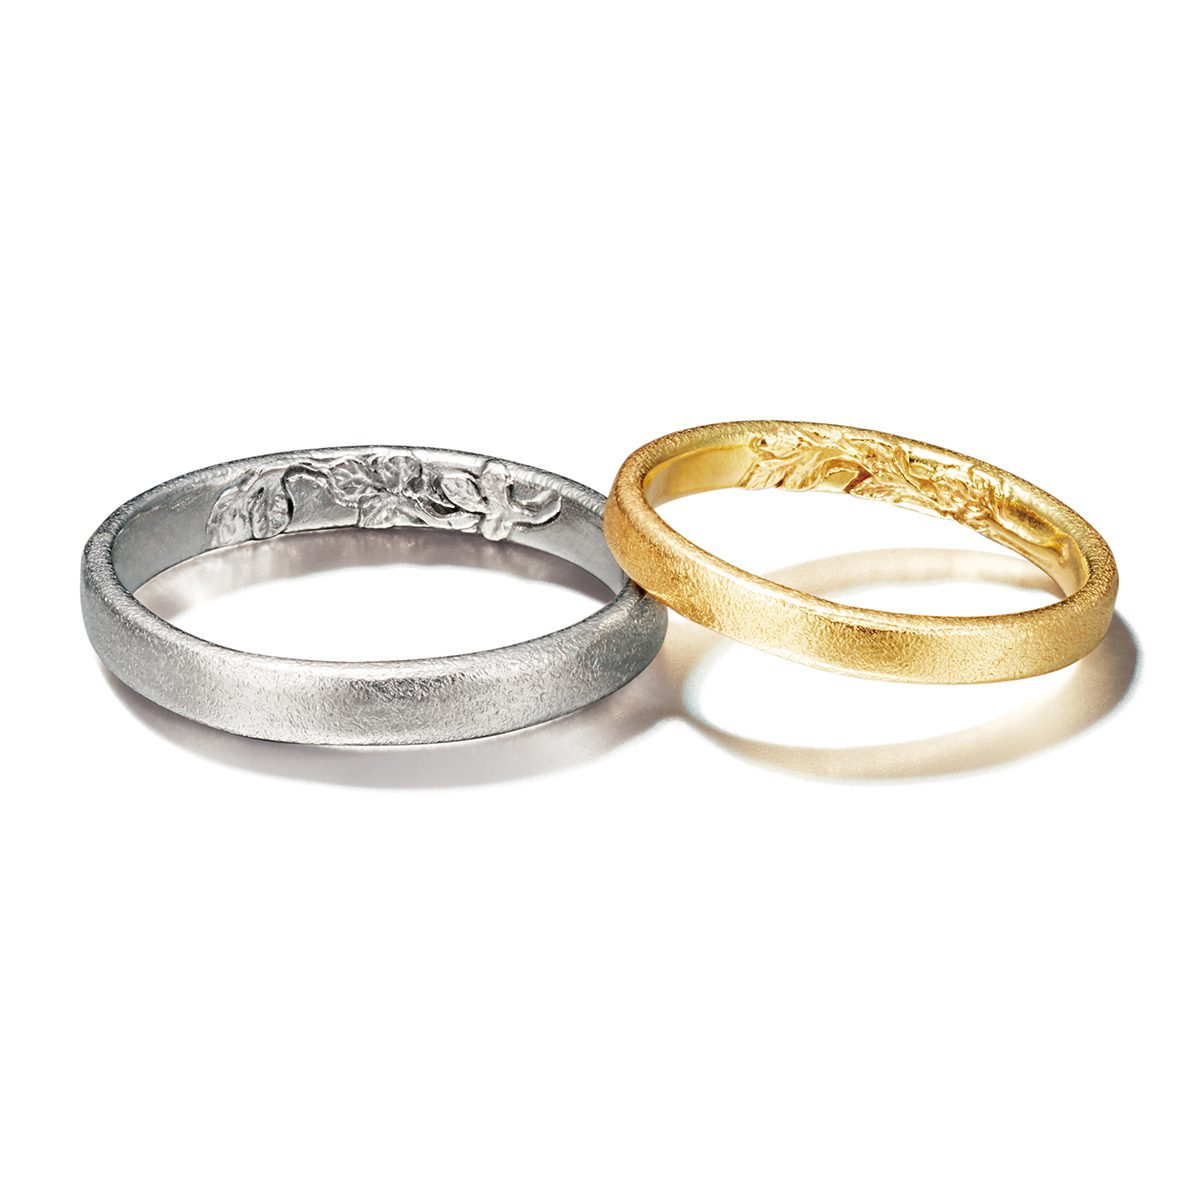 ALEX MONROE - WILD ROSE Wedding Band Marriage Rings